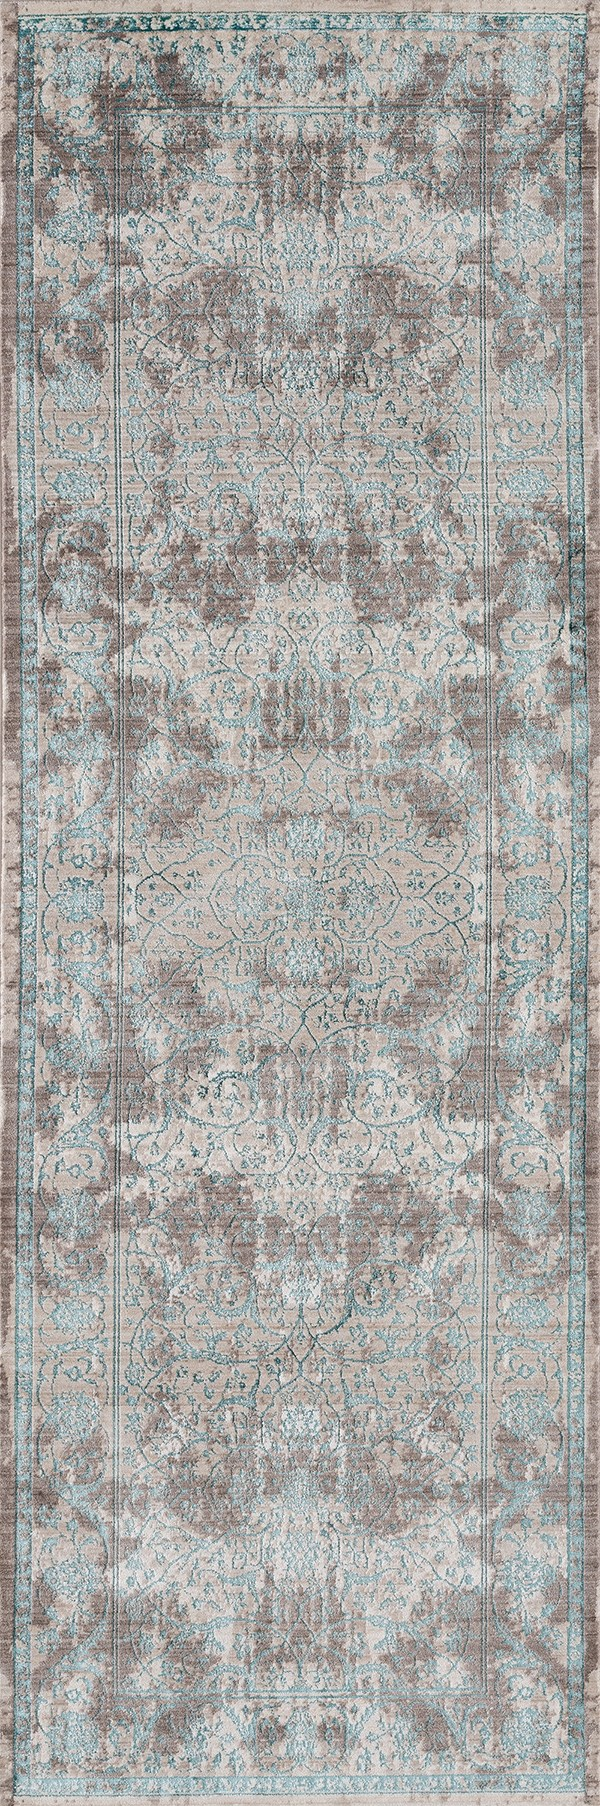 Turquoise (1805-40669) Vintage / Overdyed Area Rug